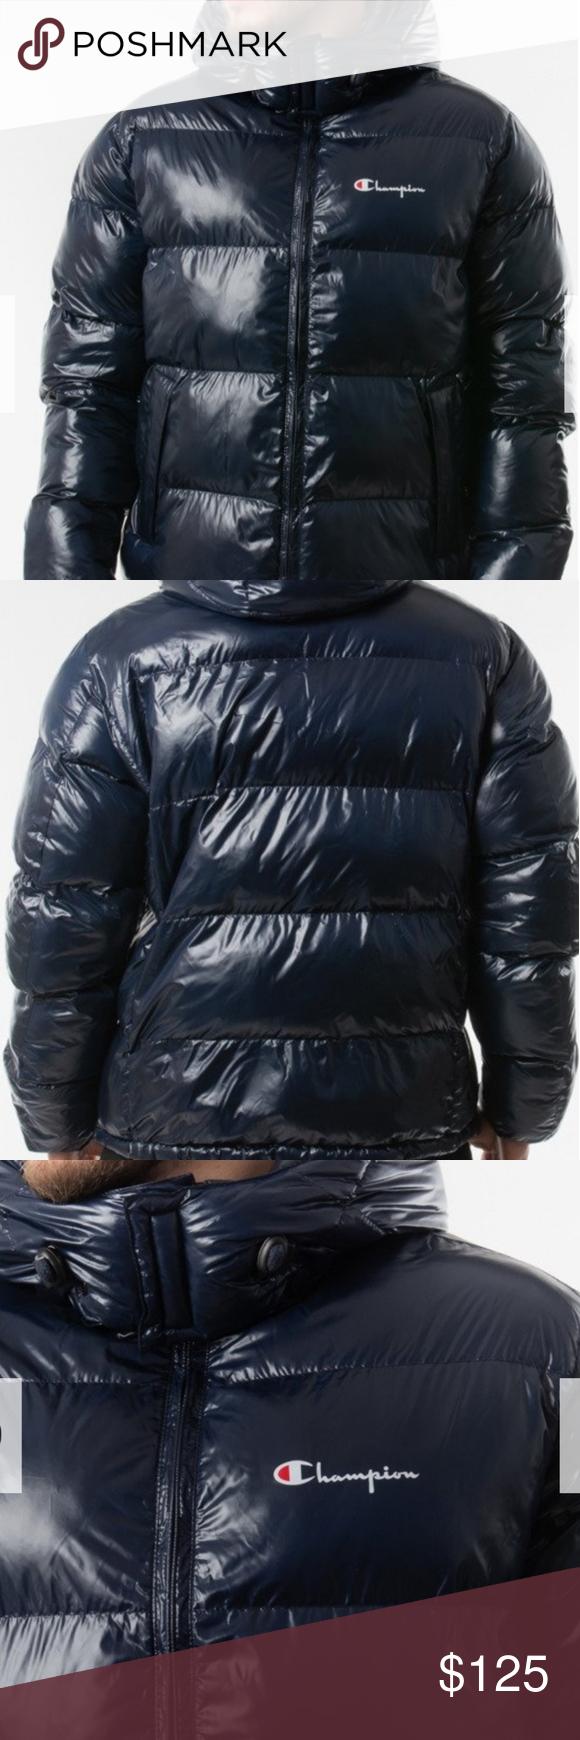 Champion Hooded Jacket 213676 Bs501 Hooded Jacket Champion Jacket Jackets [ 1740 x 580 Pixel ]